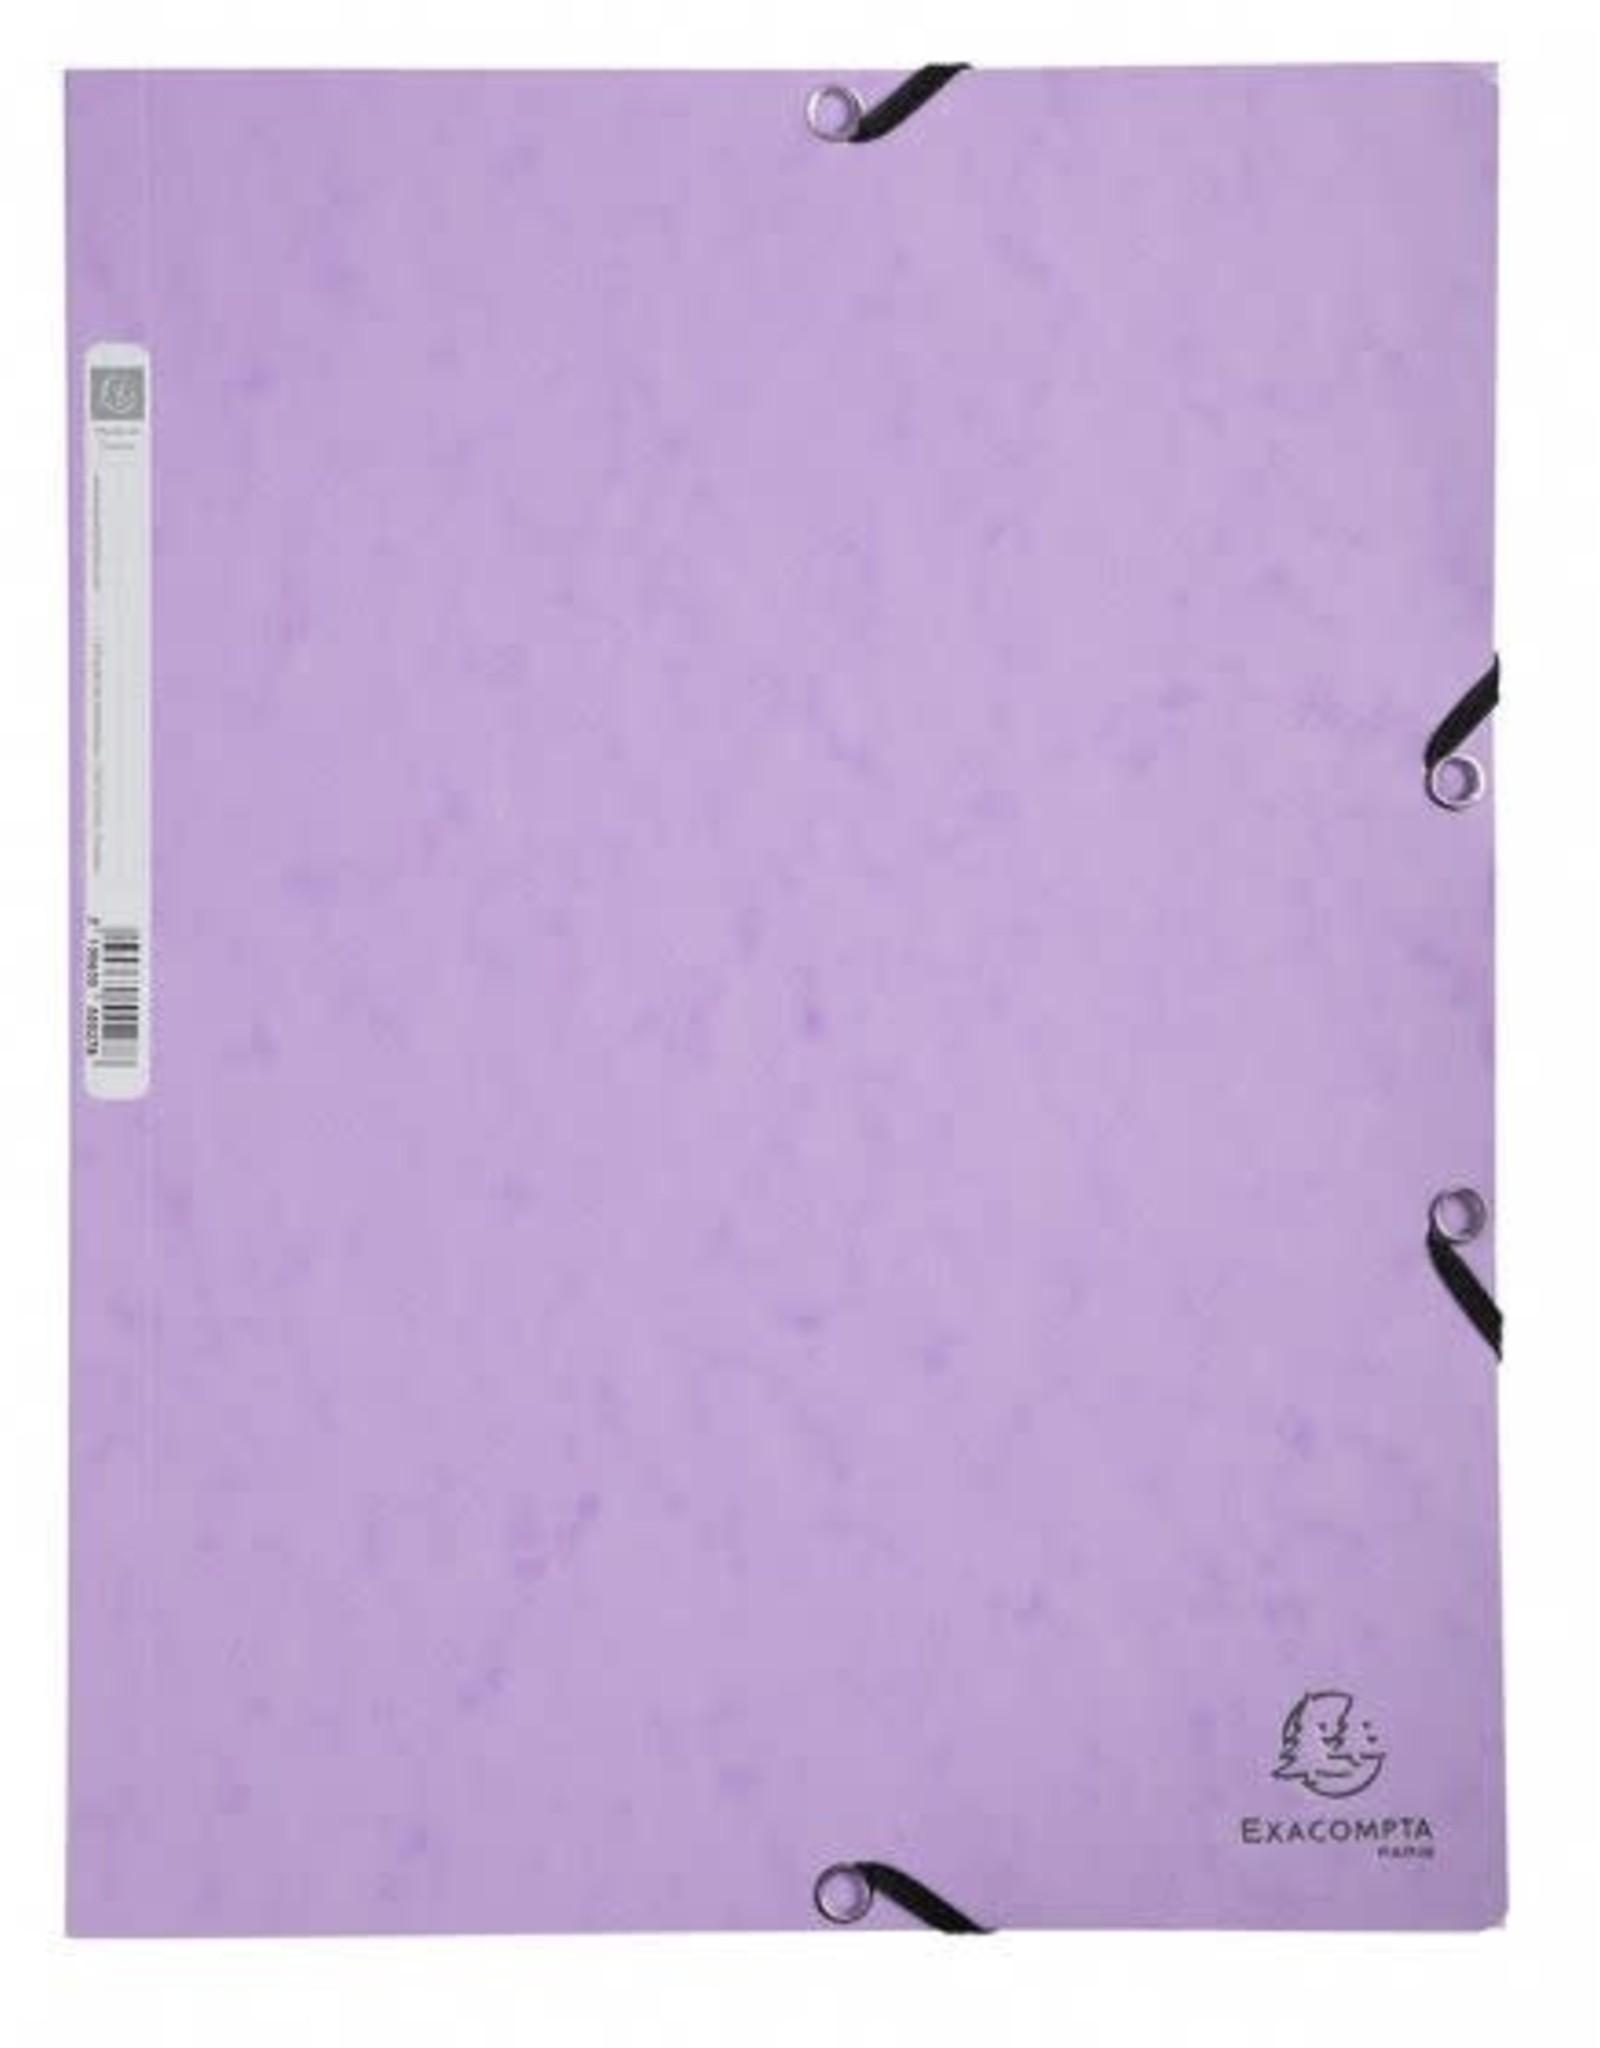 Exacompta Exacompta Pastel Three Flaps Folder